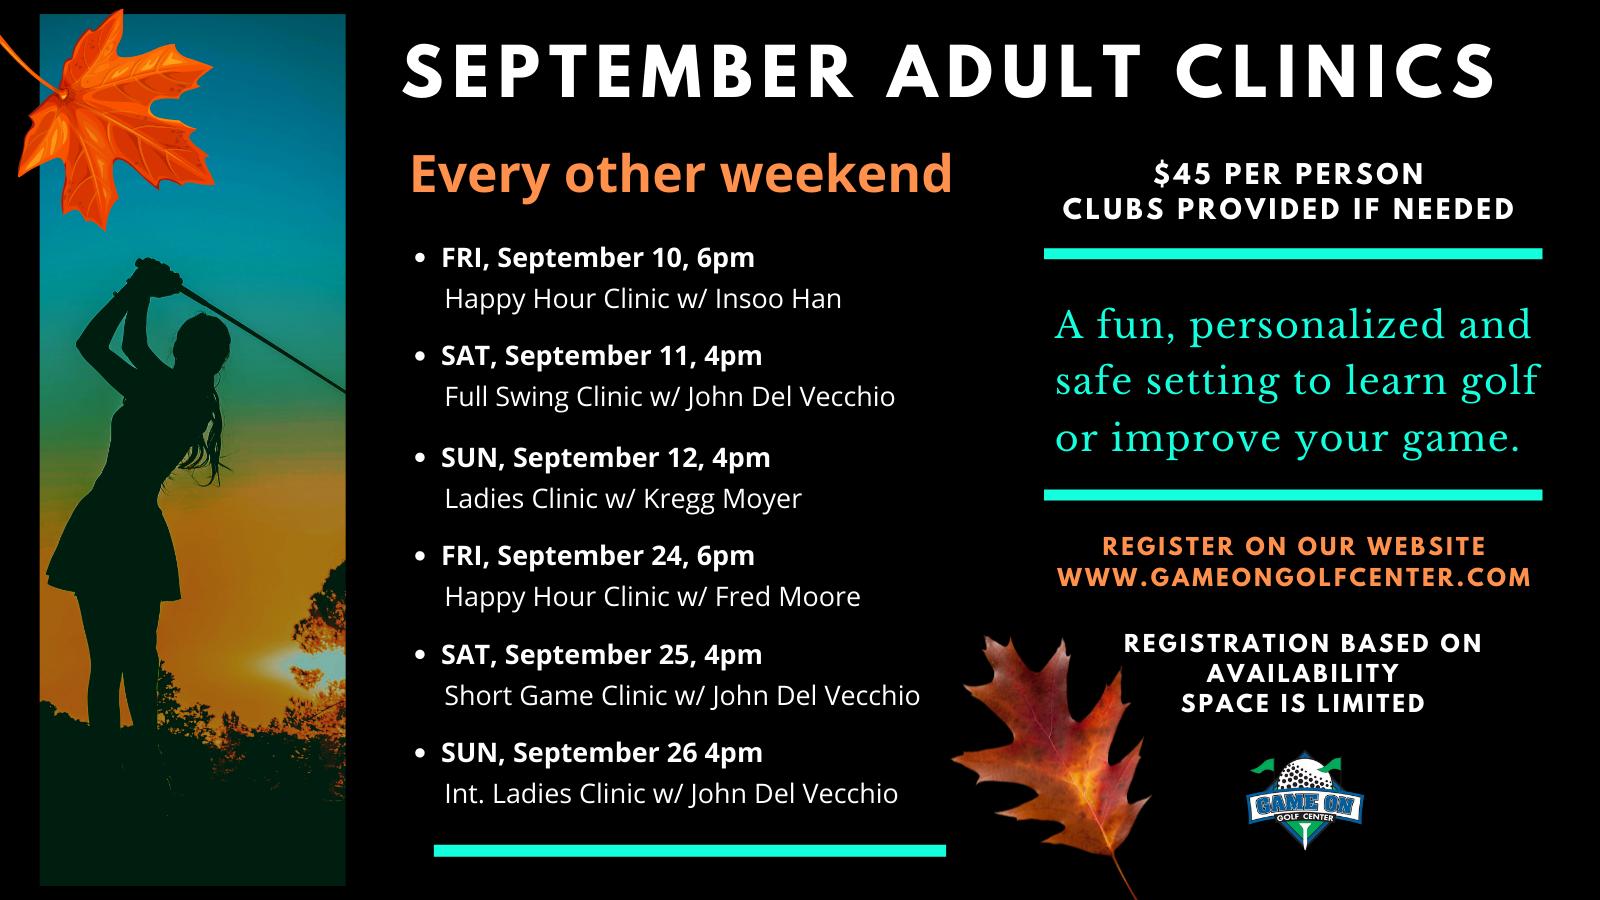 Sept 2021 Adult Summer Clinics - TW (1)